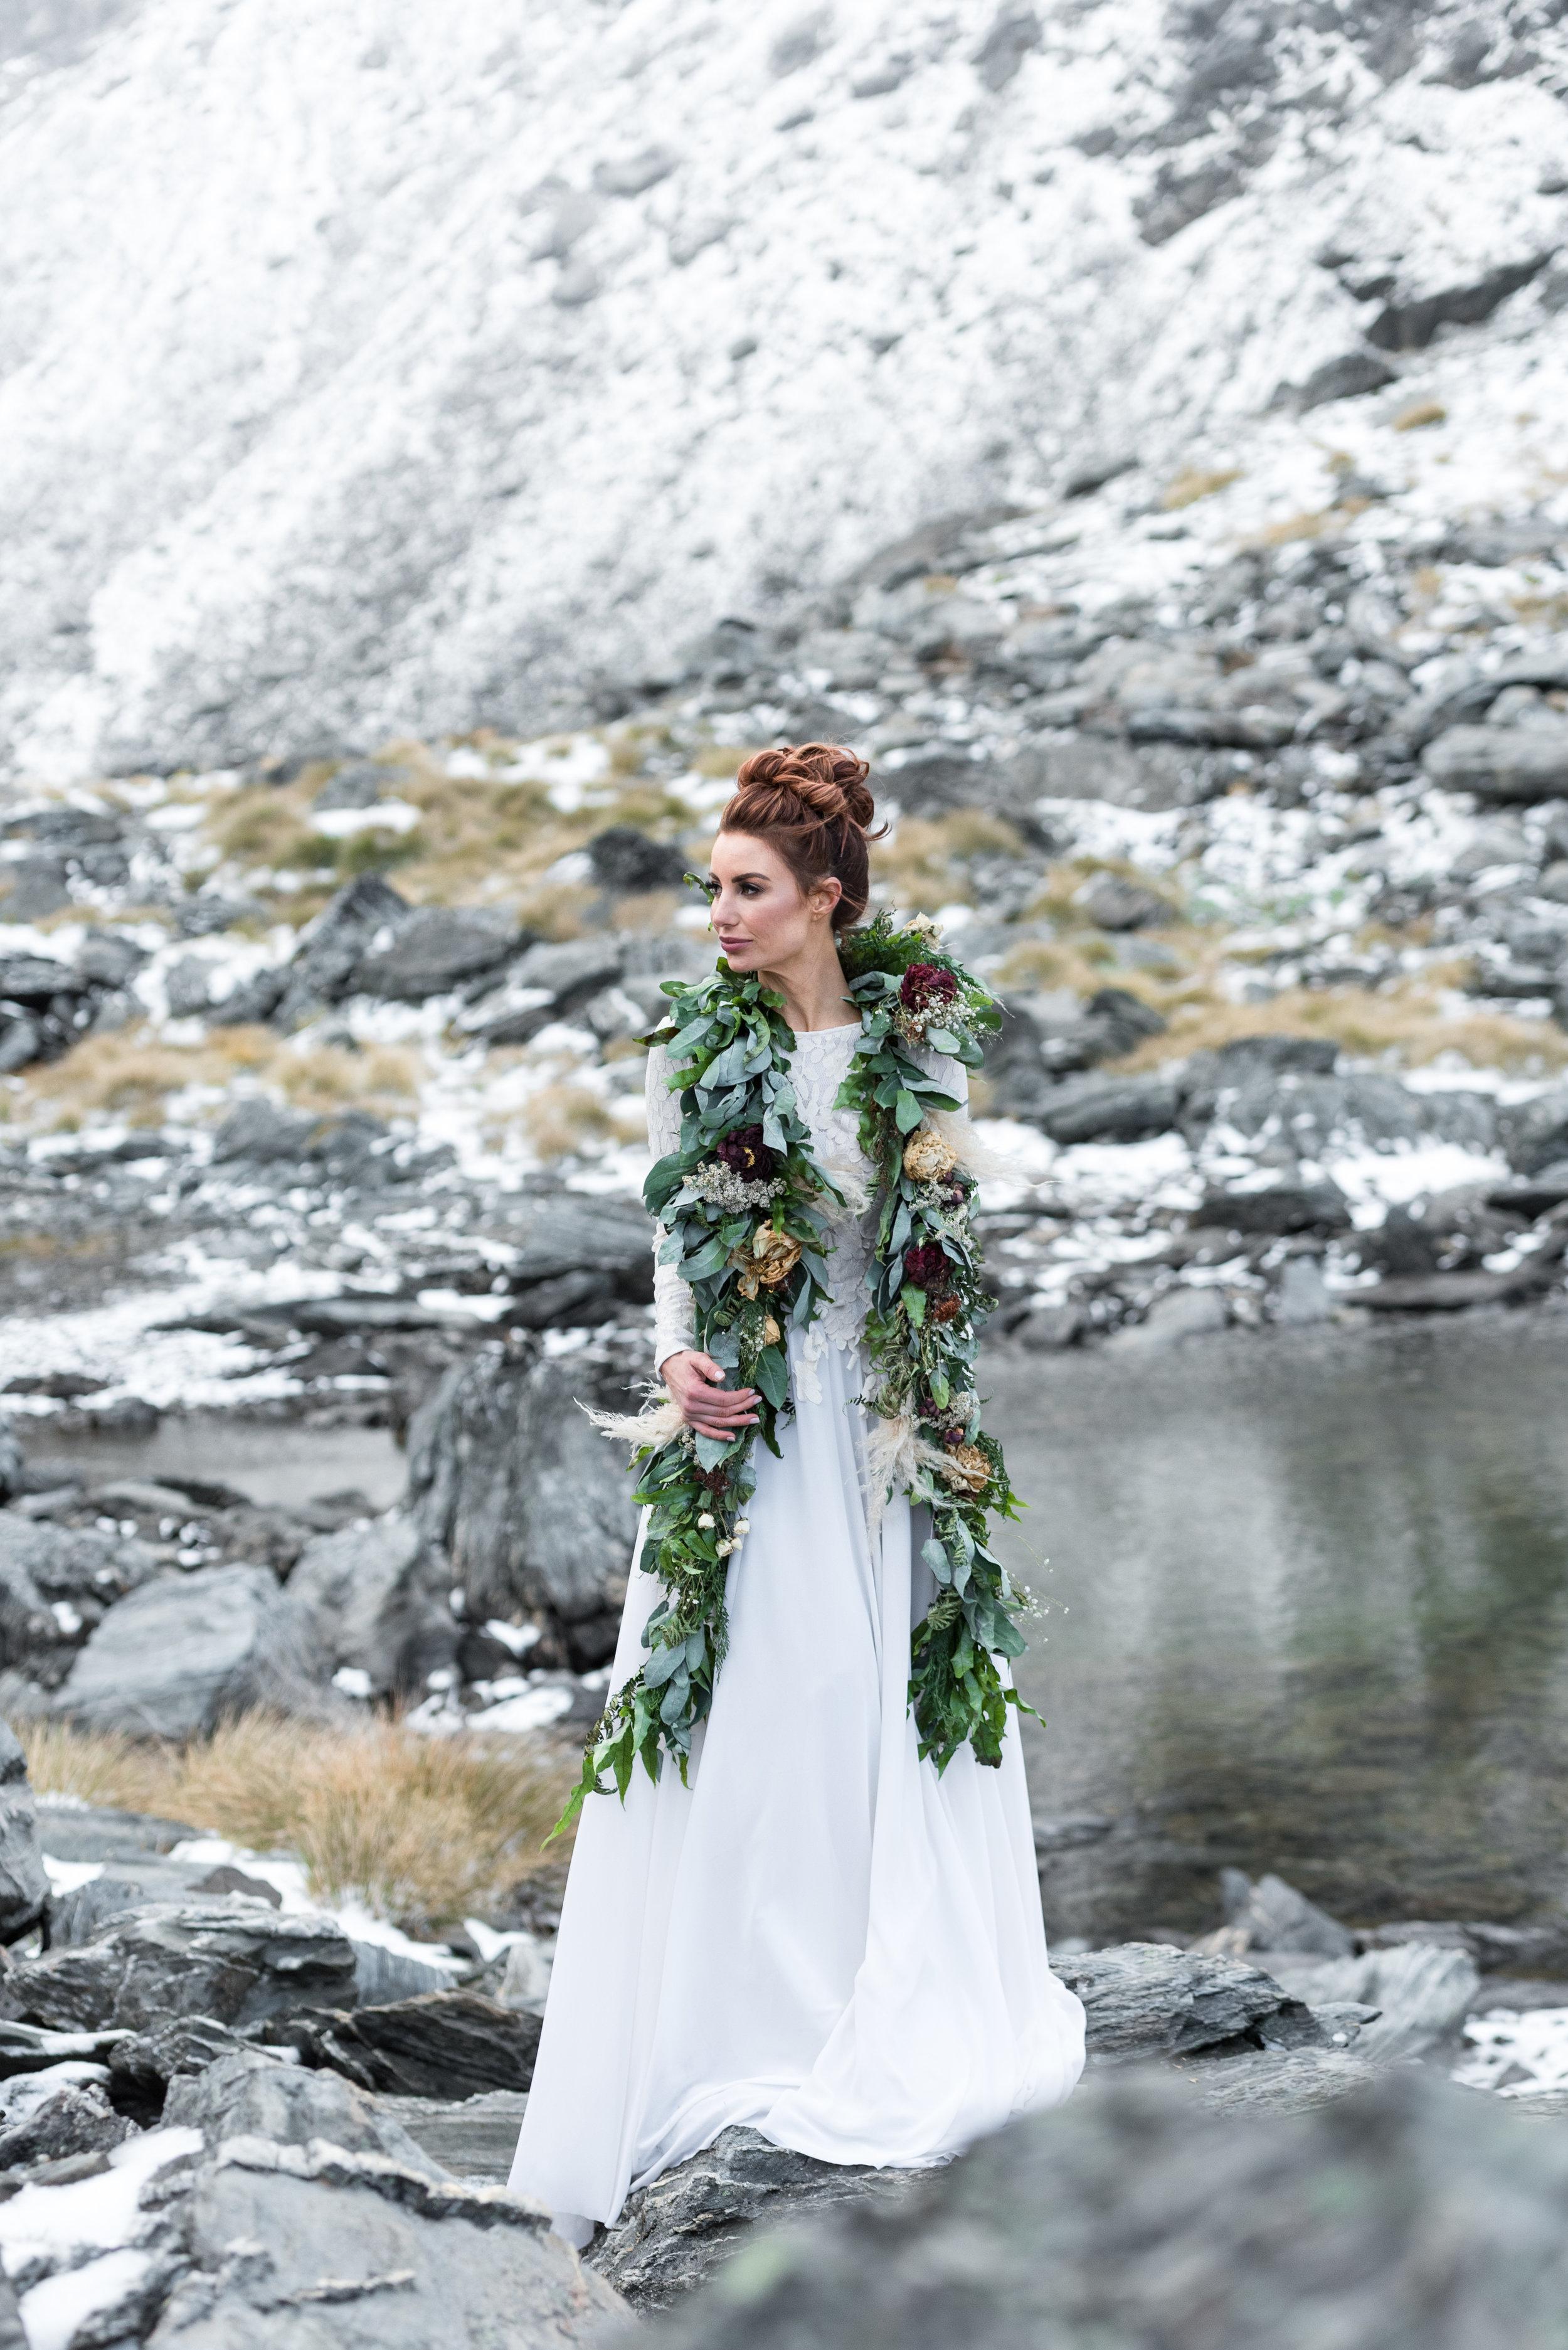 NZ_LakeAlta_2490.jpg